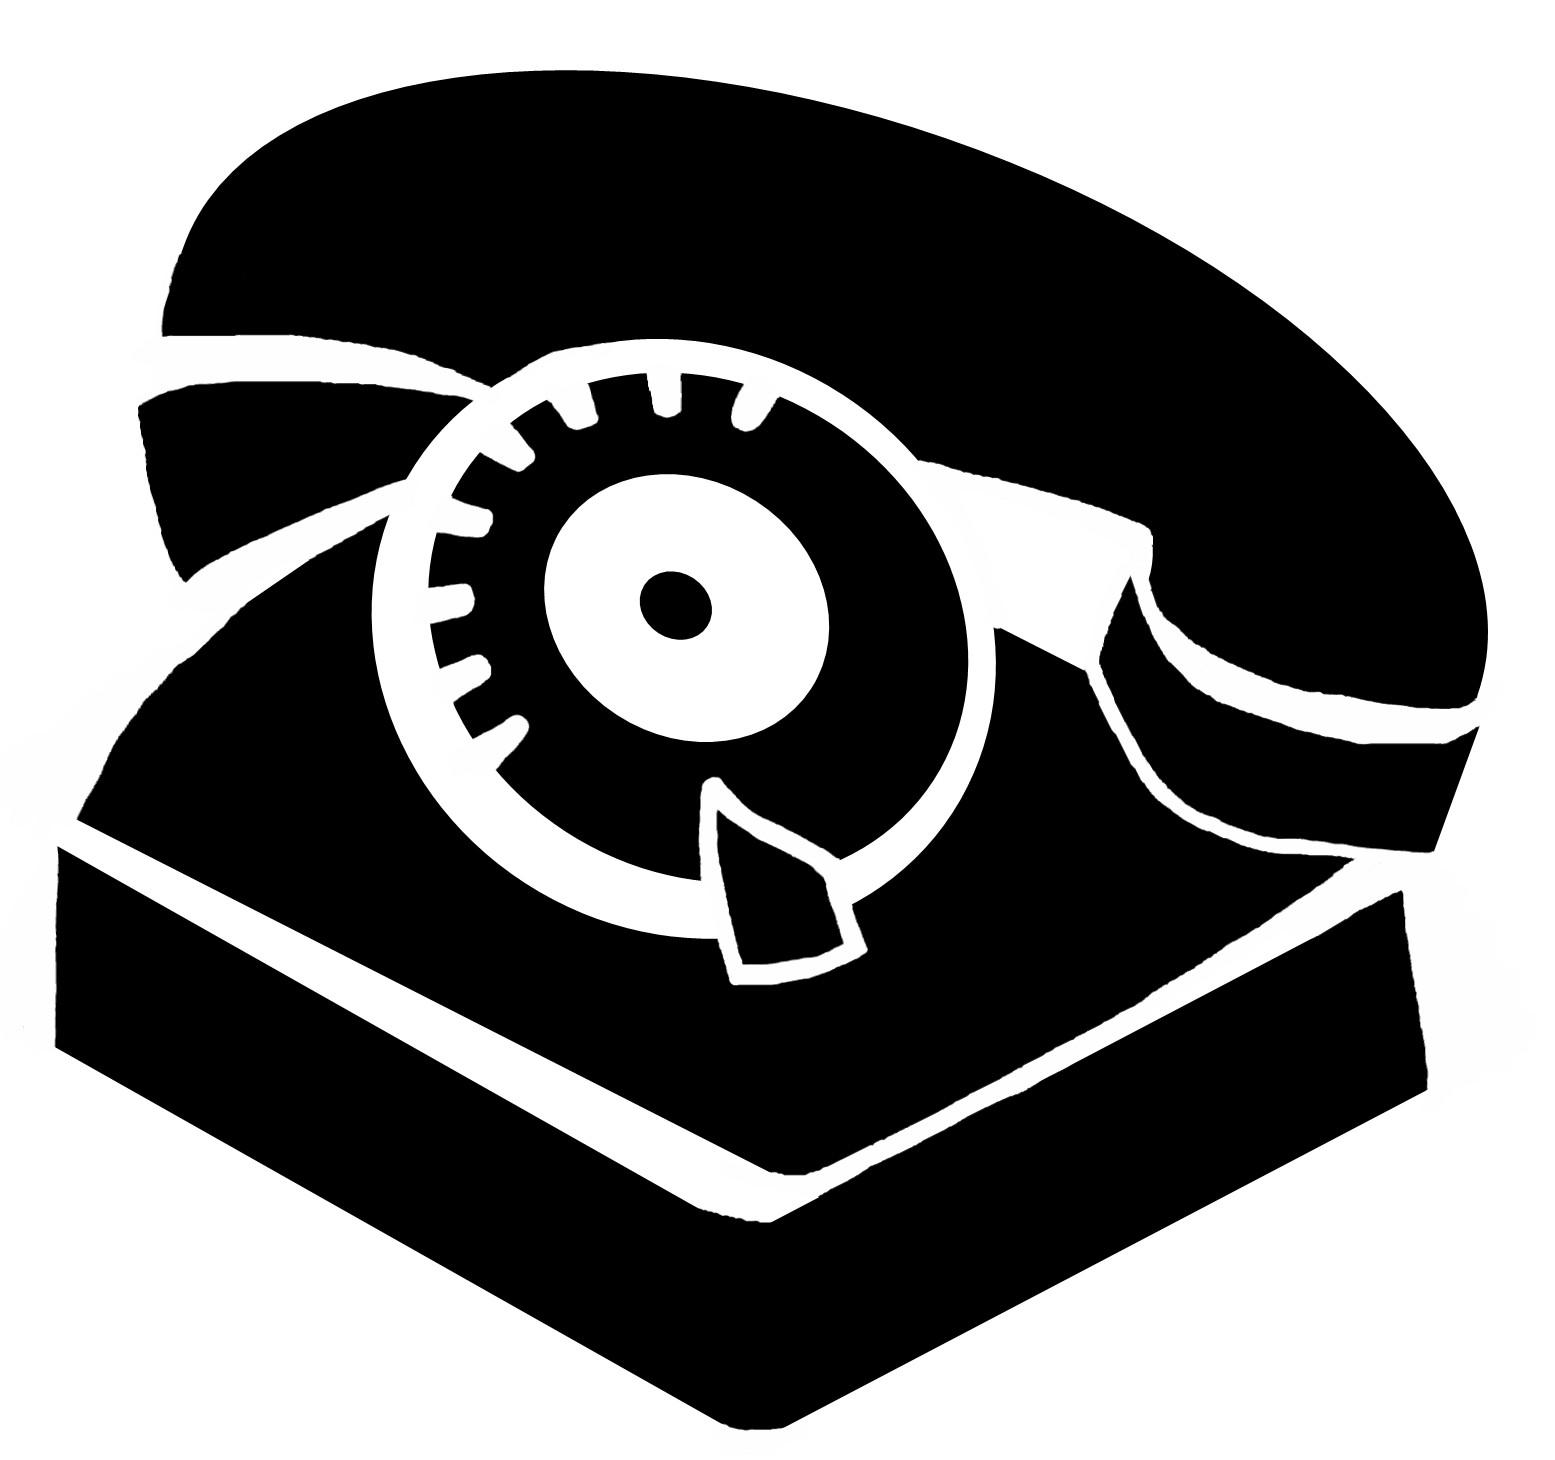 clipart kostenlos telefon - photo #41